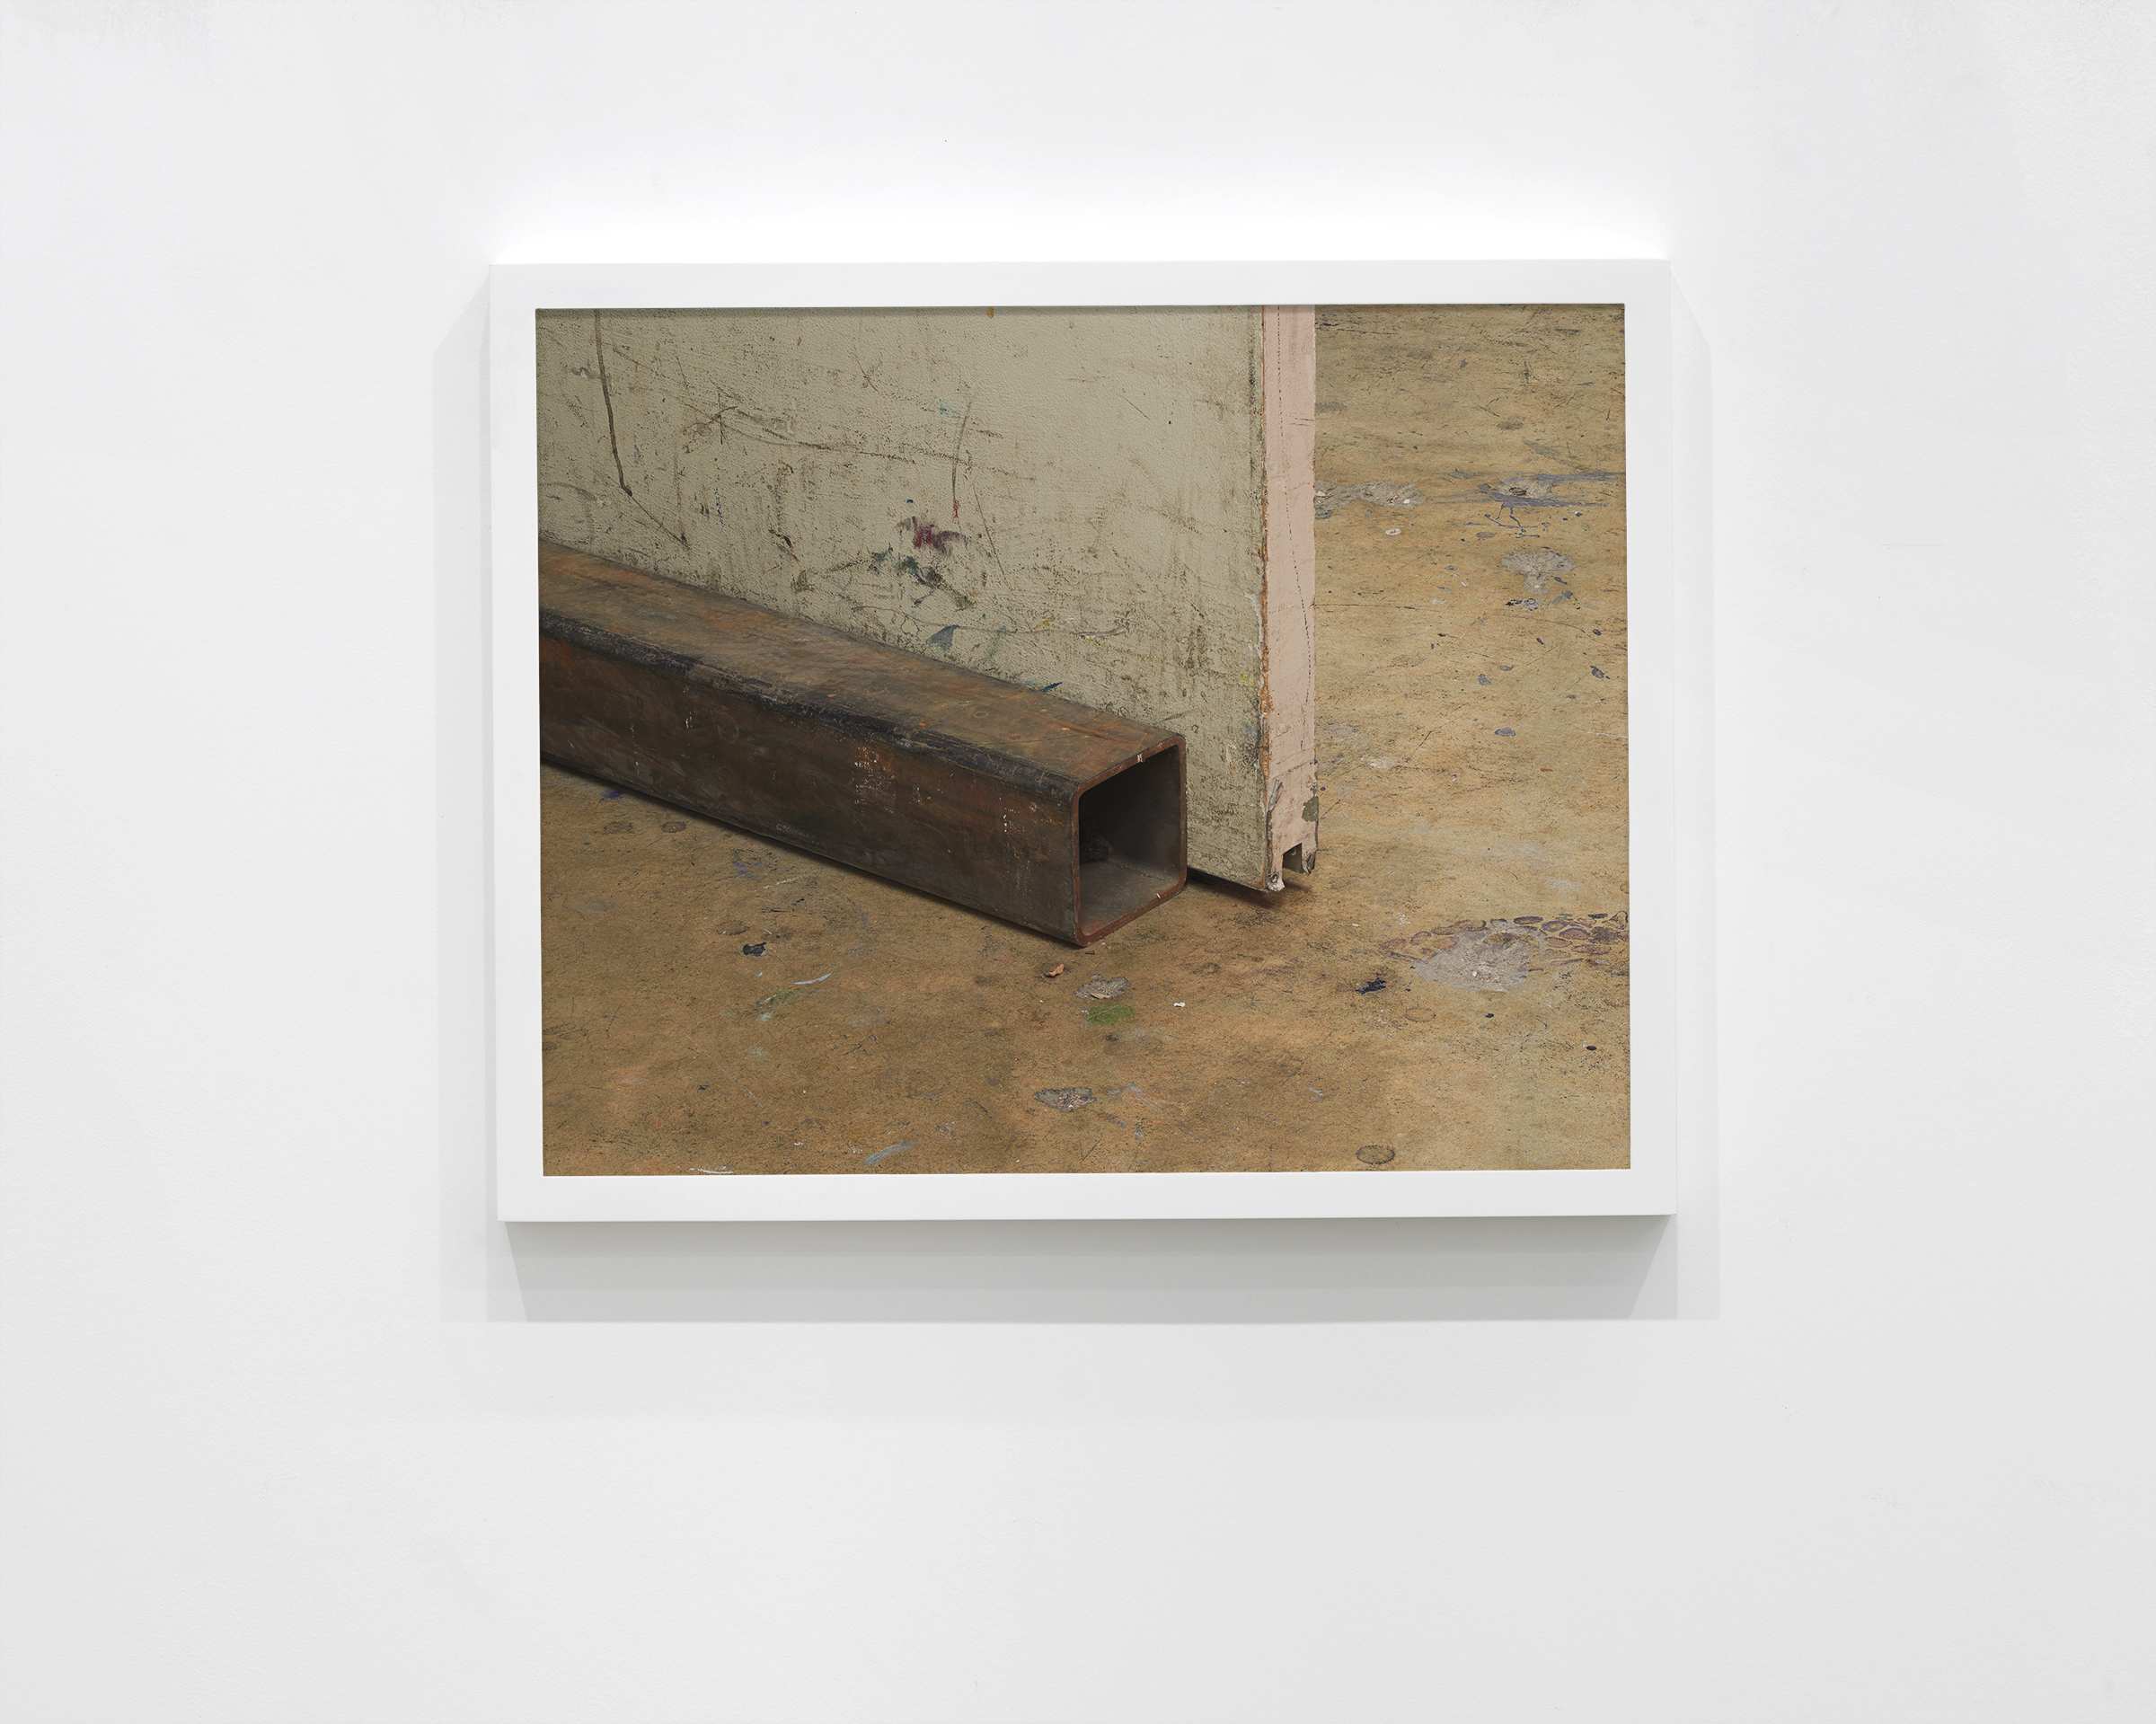 """Warner Study #25"", 2017 - 2018  16 x 20 in. (40.64 x 50.80 cm)"